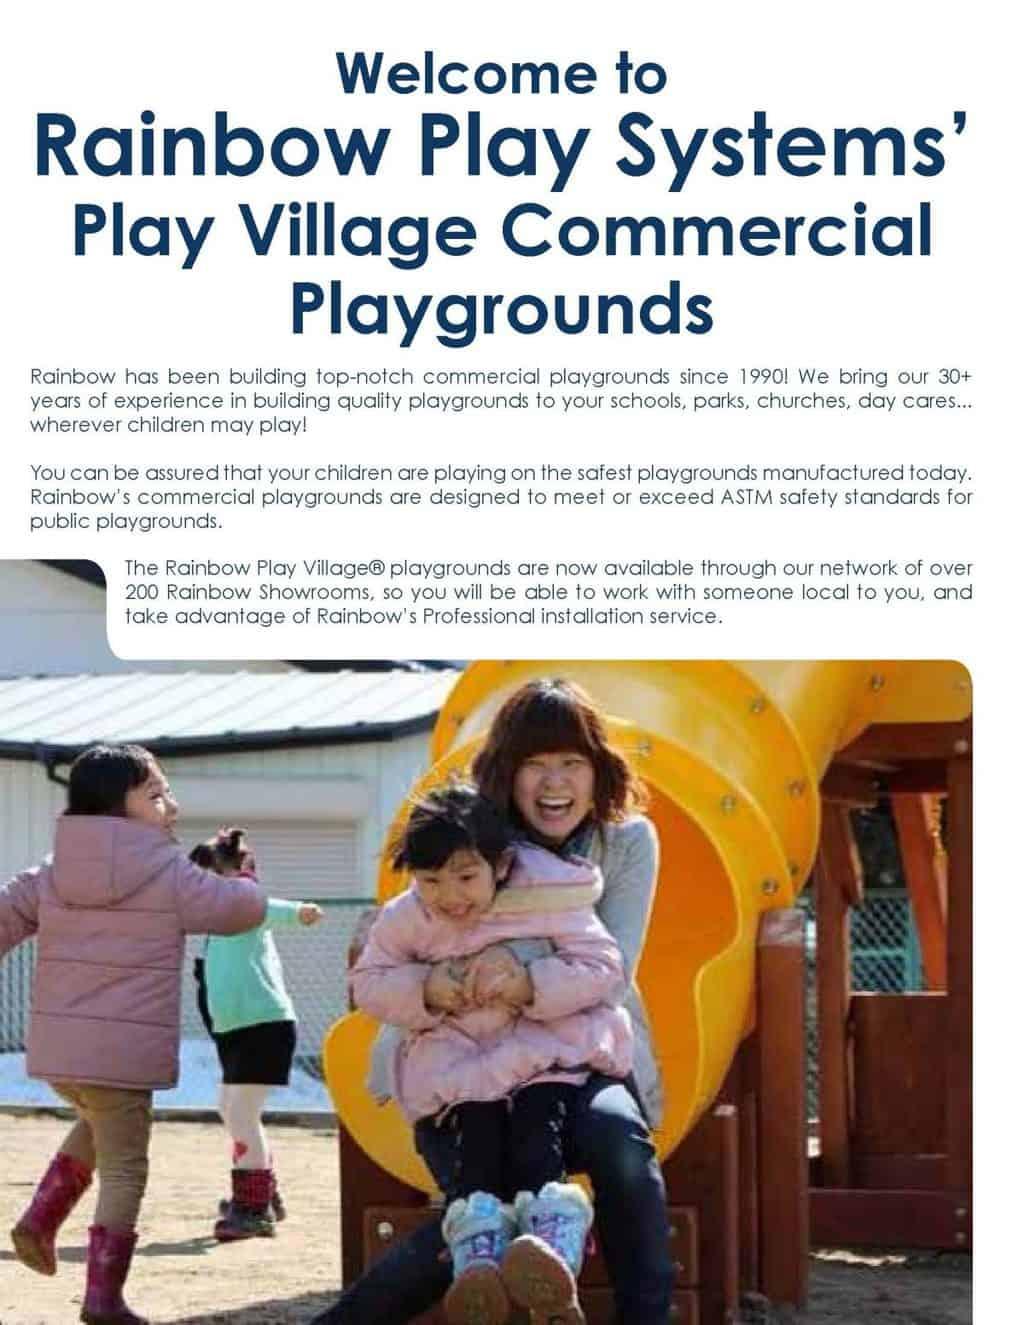 Rainbow Play Village Design 403 (24)